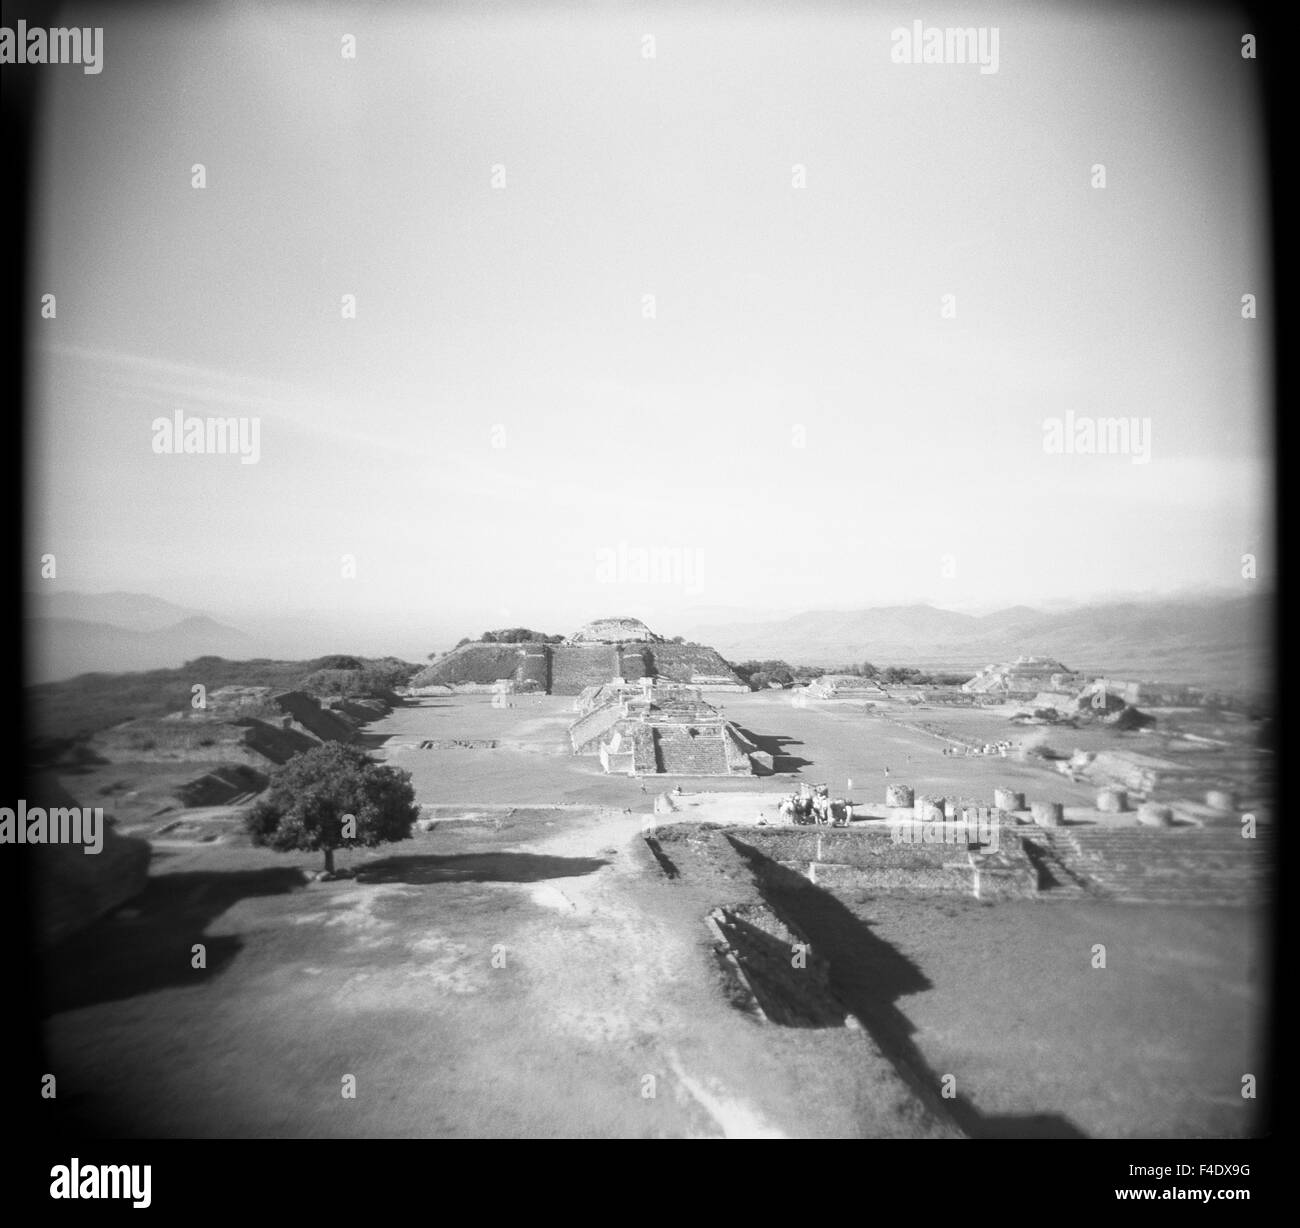 Stein Ruinen am Monte Alban. Oaxaca, Mexiko Stockbild